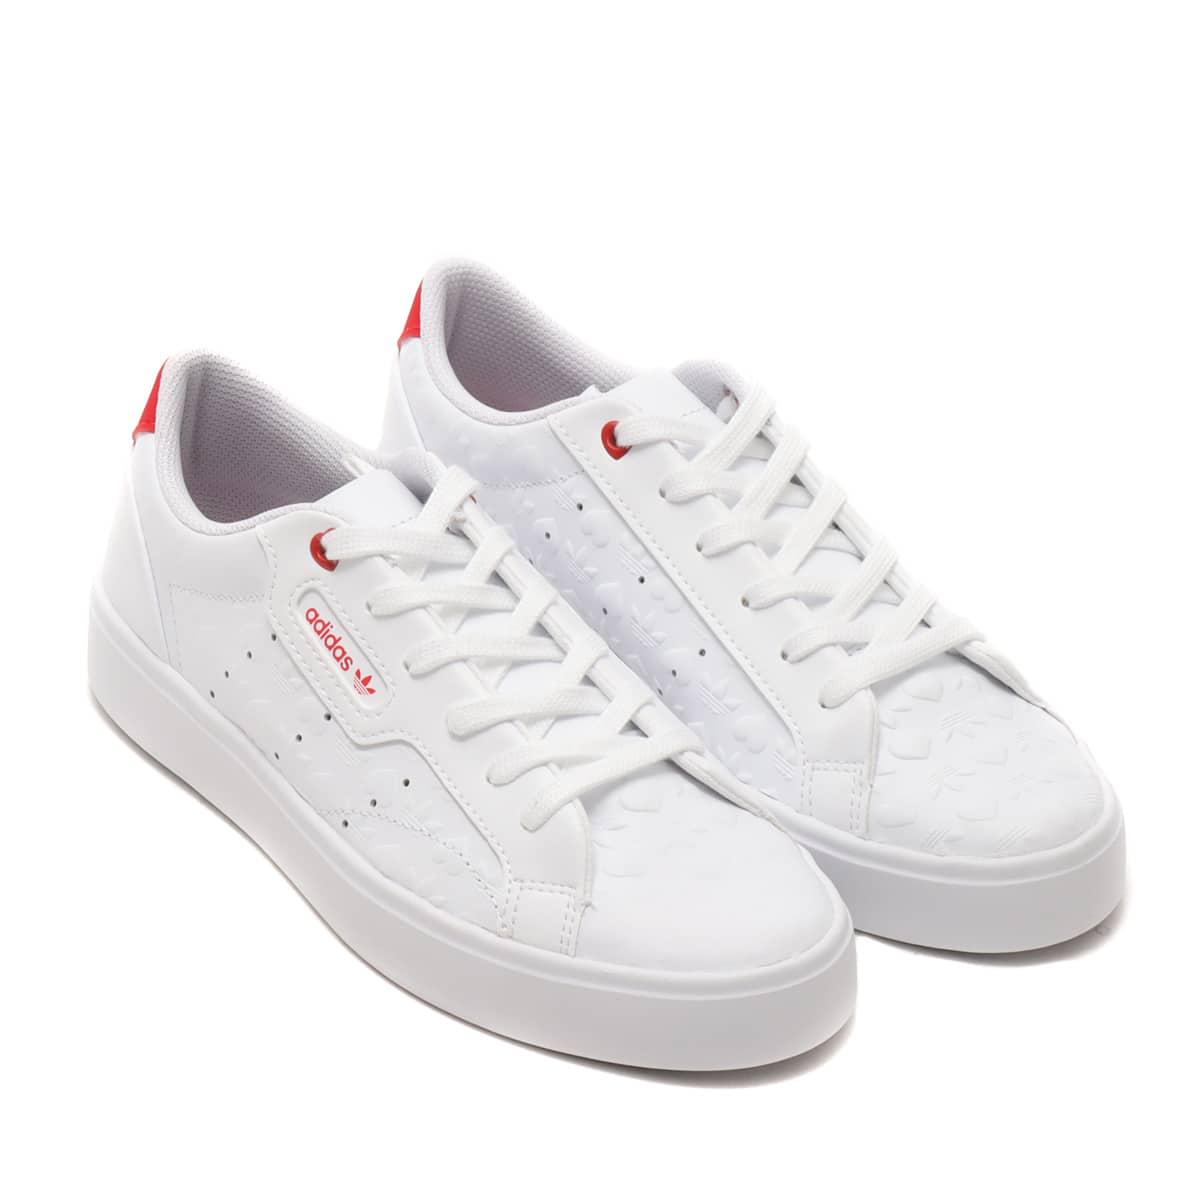 adidas adidas SLEEK W FOOTWEAR WHITE/SCARLET/CORE BLACK 21SS-S_photo_large